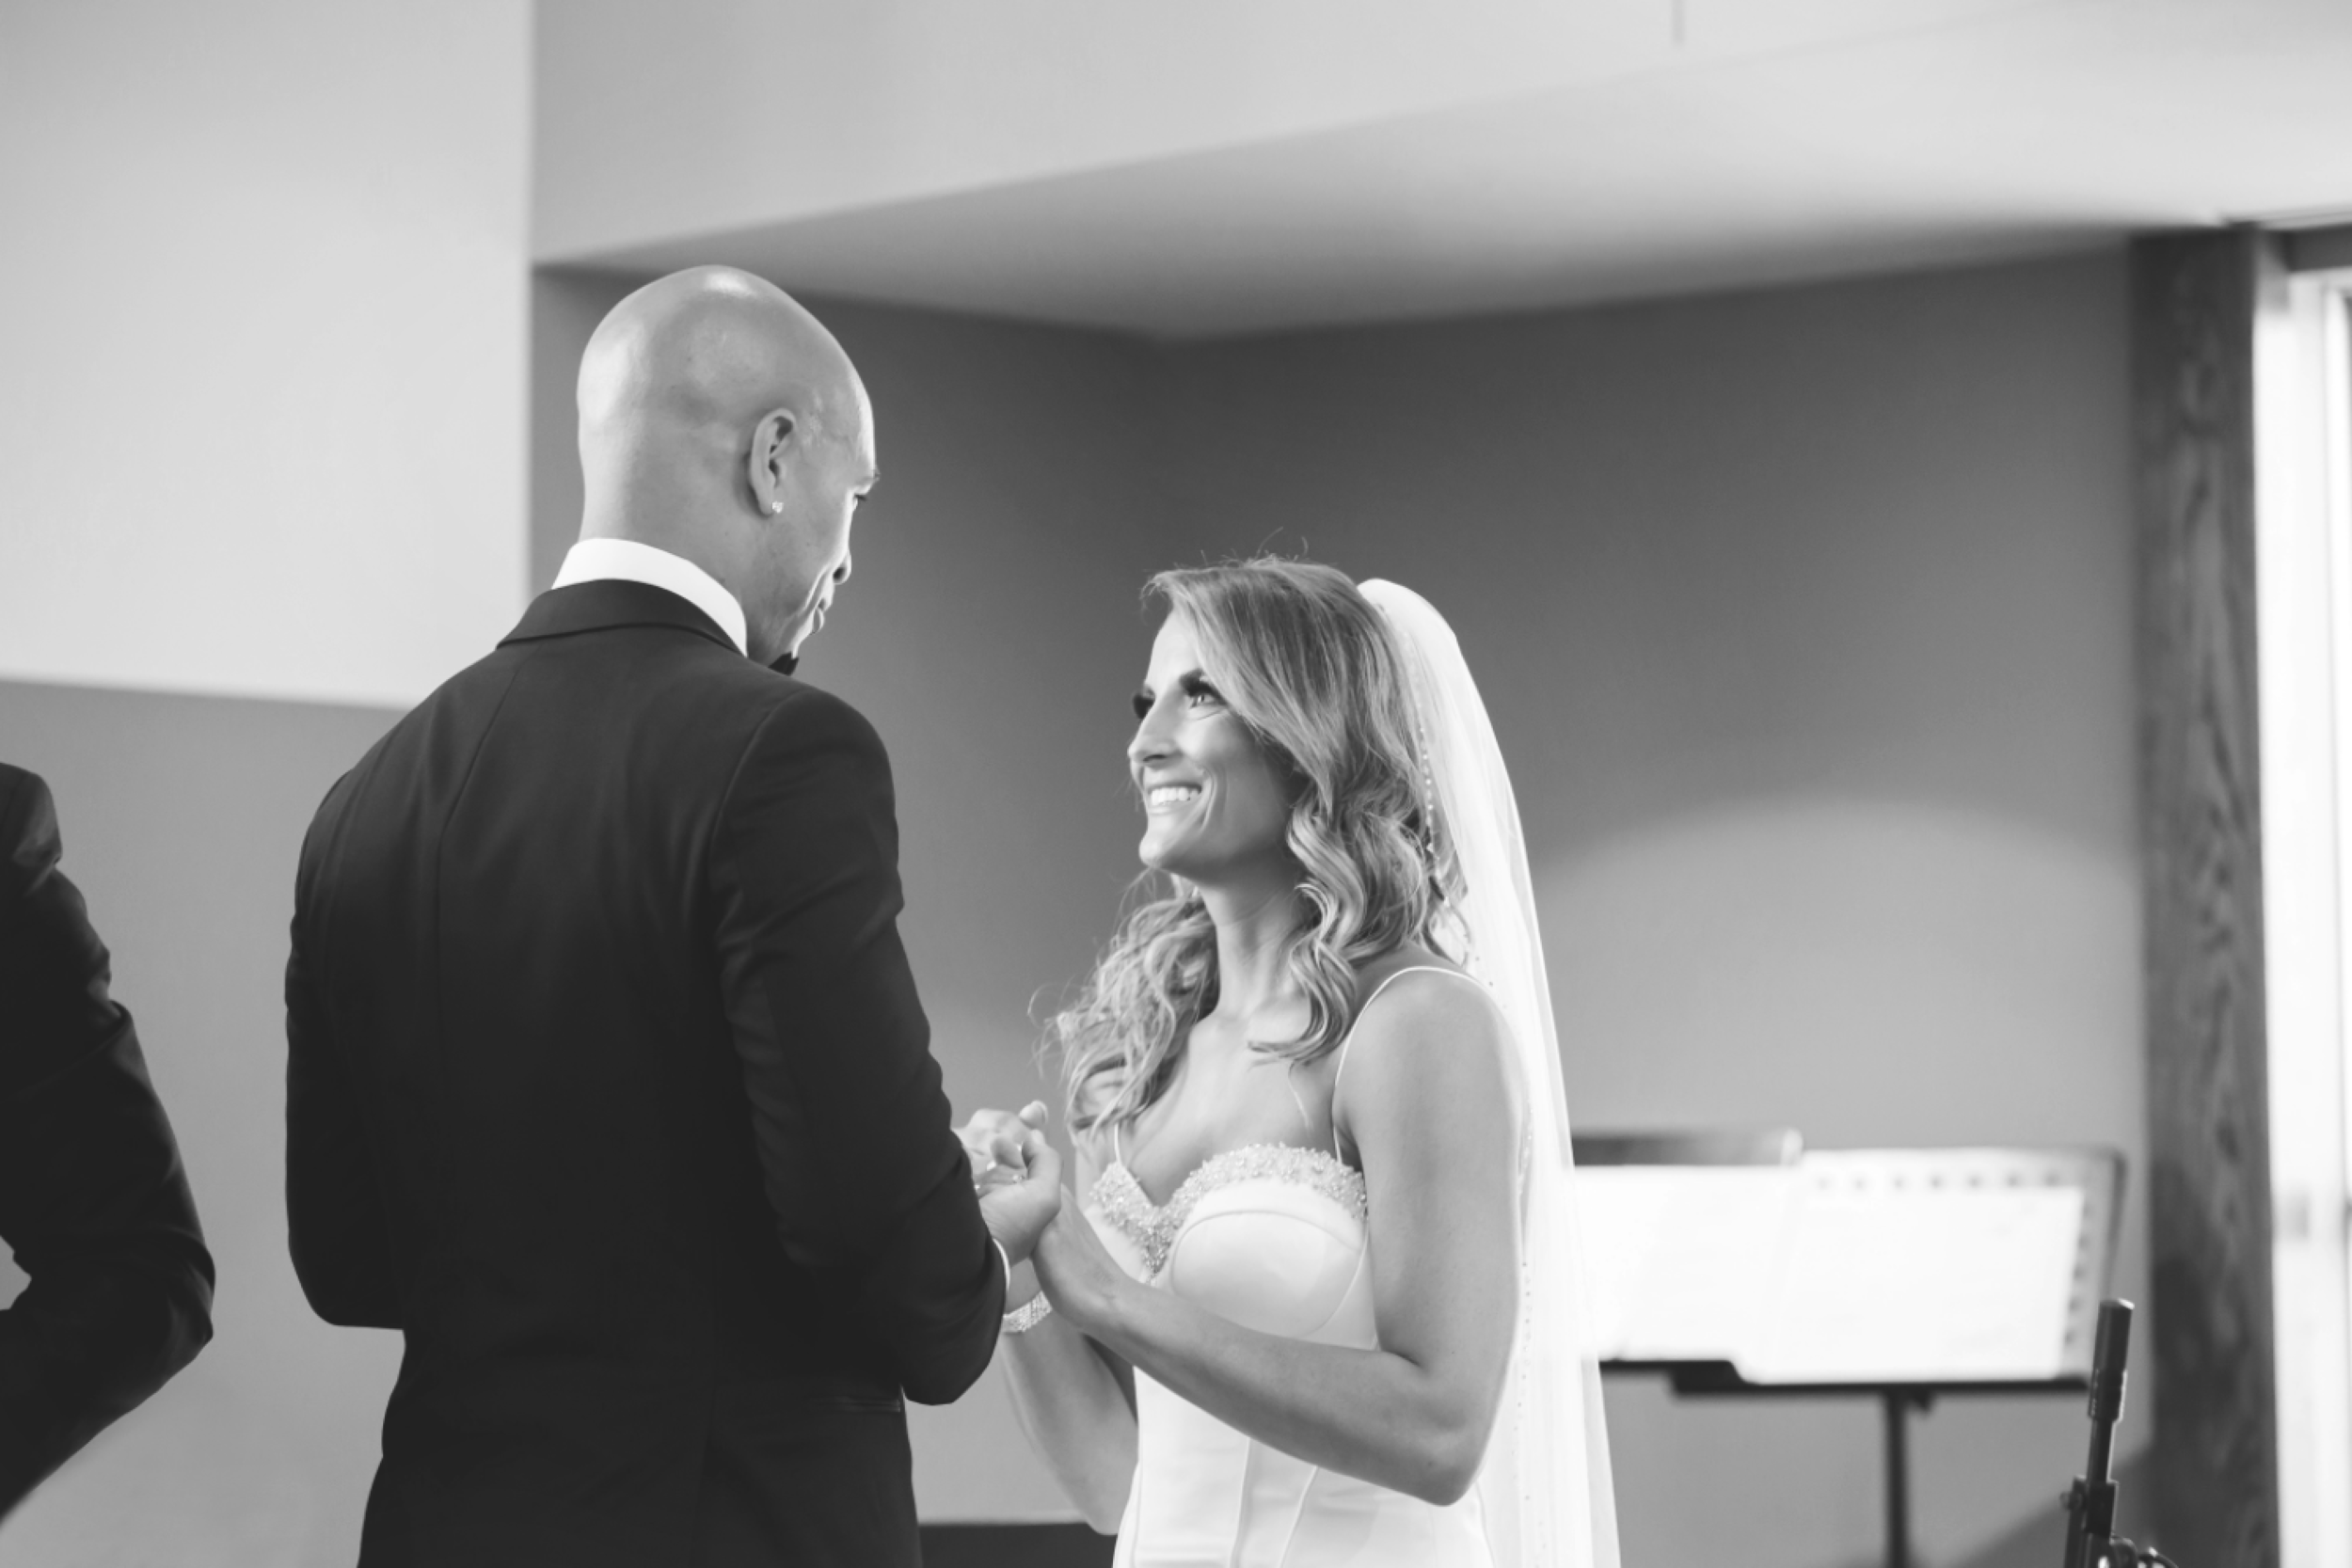 Wedding-Burlington-Convention-Center-Burlington-Oakville-Toronto-Hamilton-Niagara-Wedding-Photographer-Photography-Moments-by-Lauren-Photo-Image-23.png